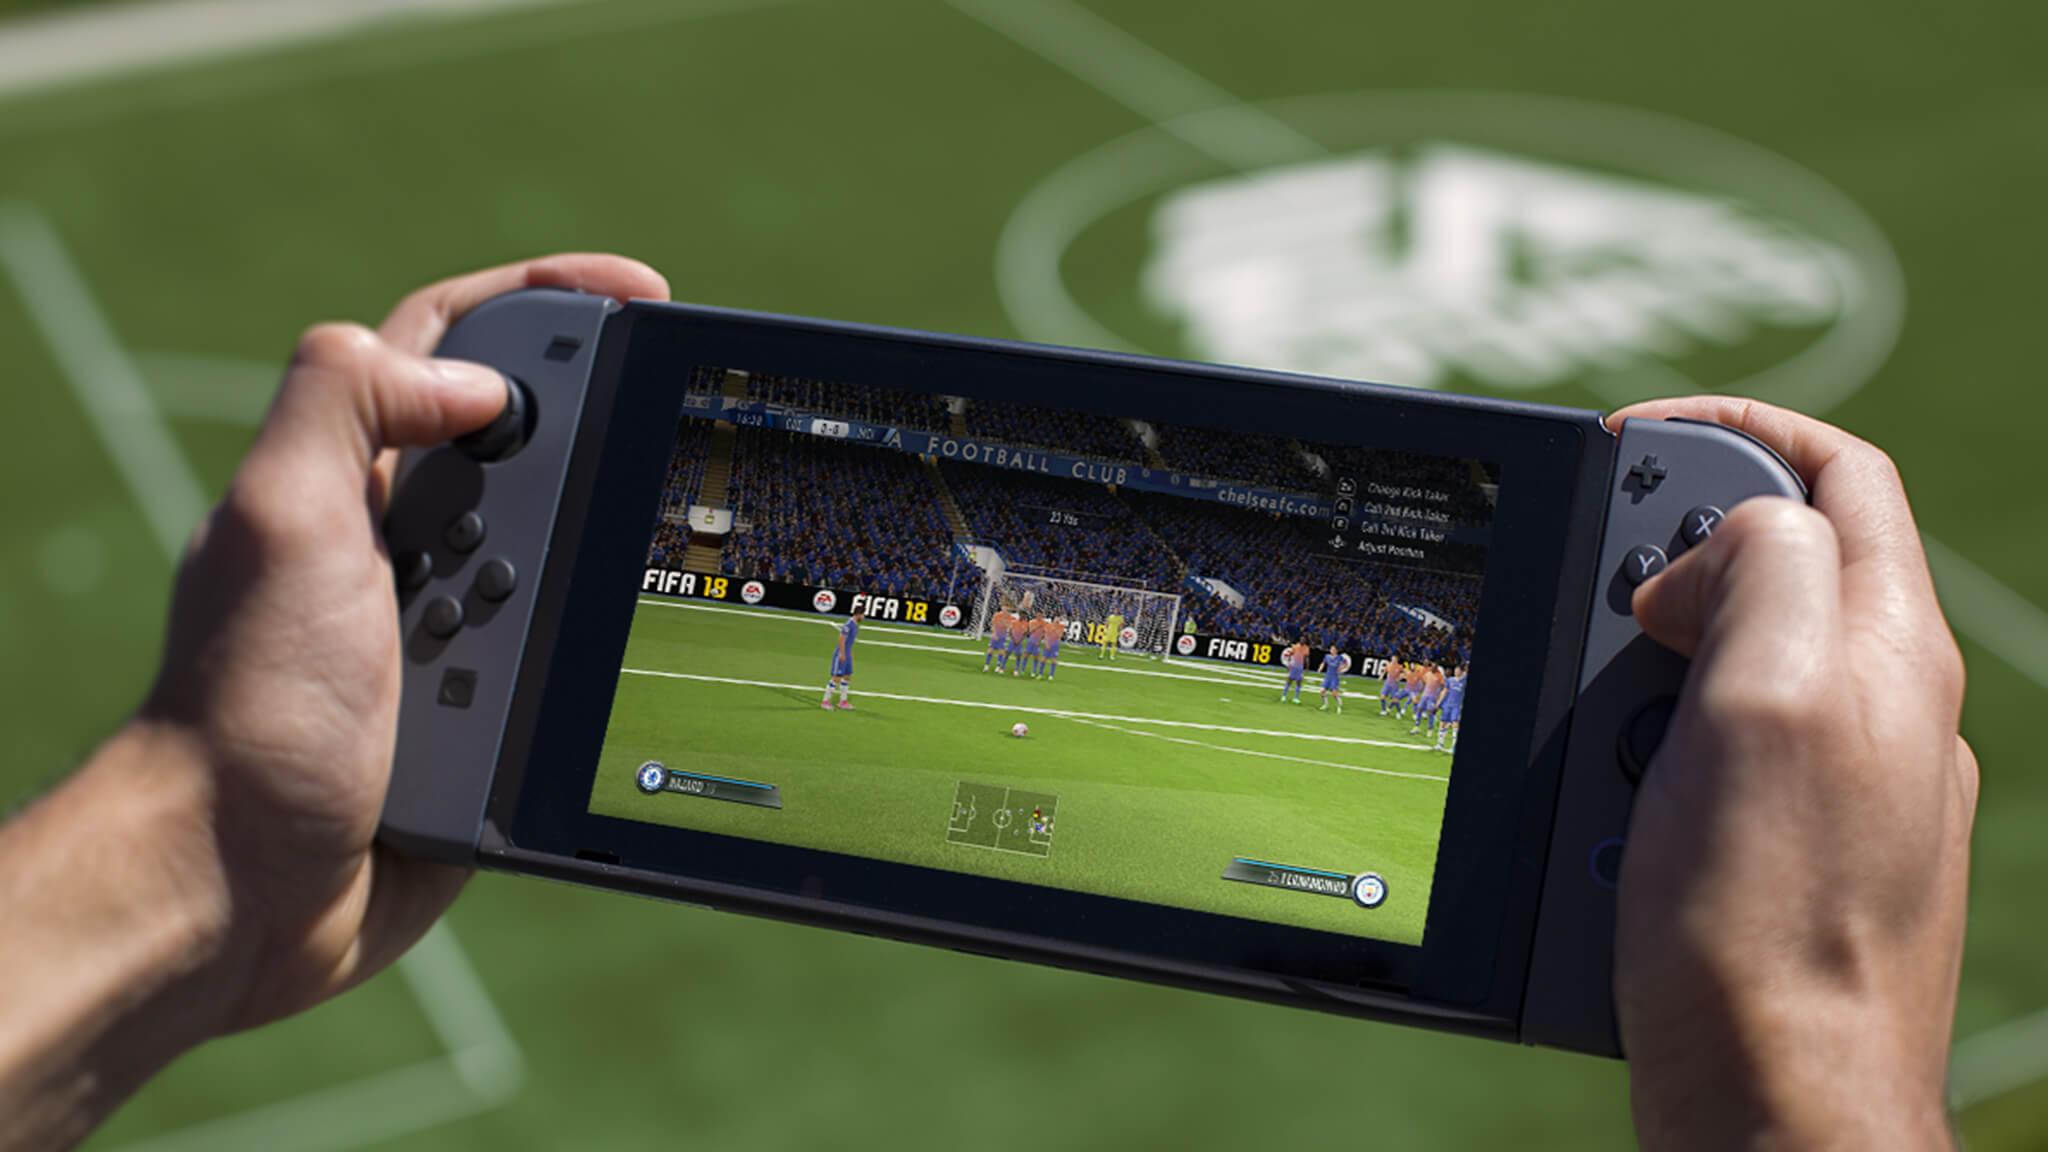 FIFA 18 : La Coupe du Monde sera disponible gratuitement !